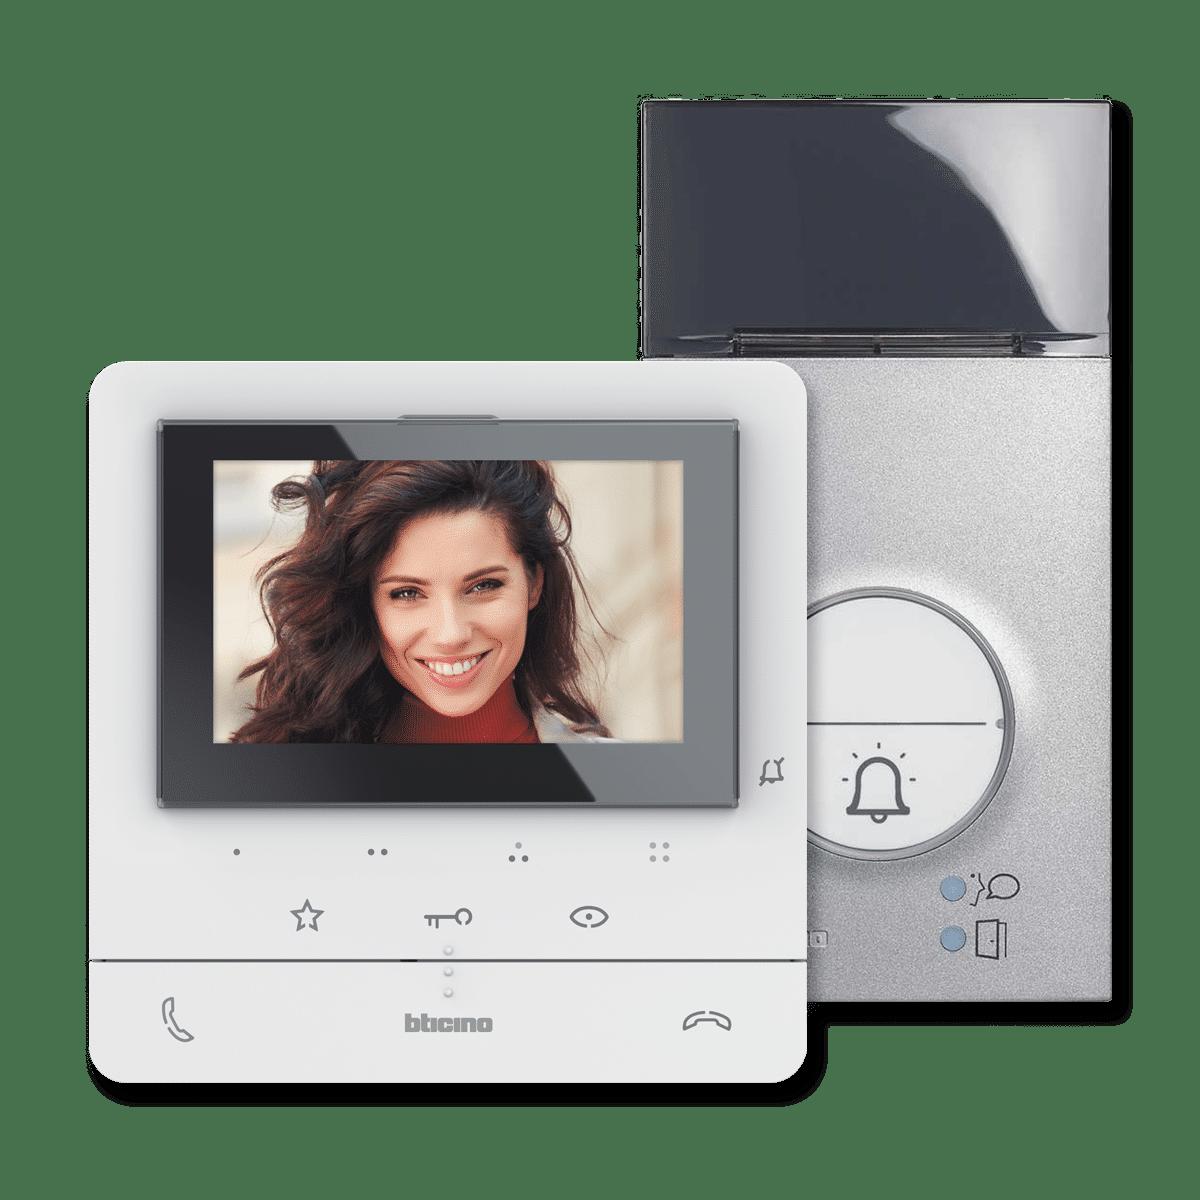 Kit videocitofono villa | Kit videocitofono Classe 100 e Classe 300